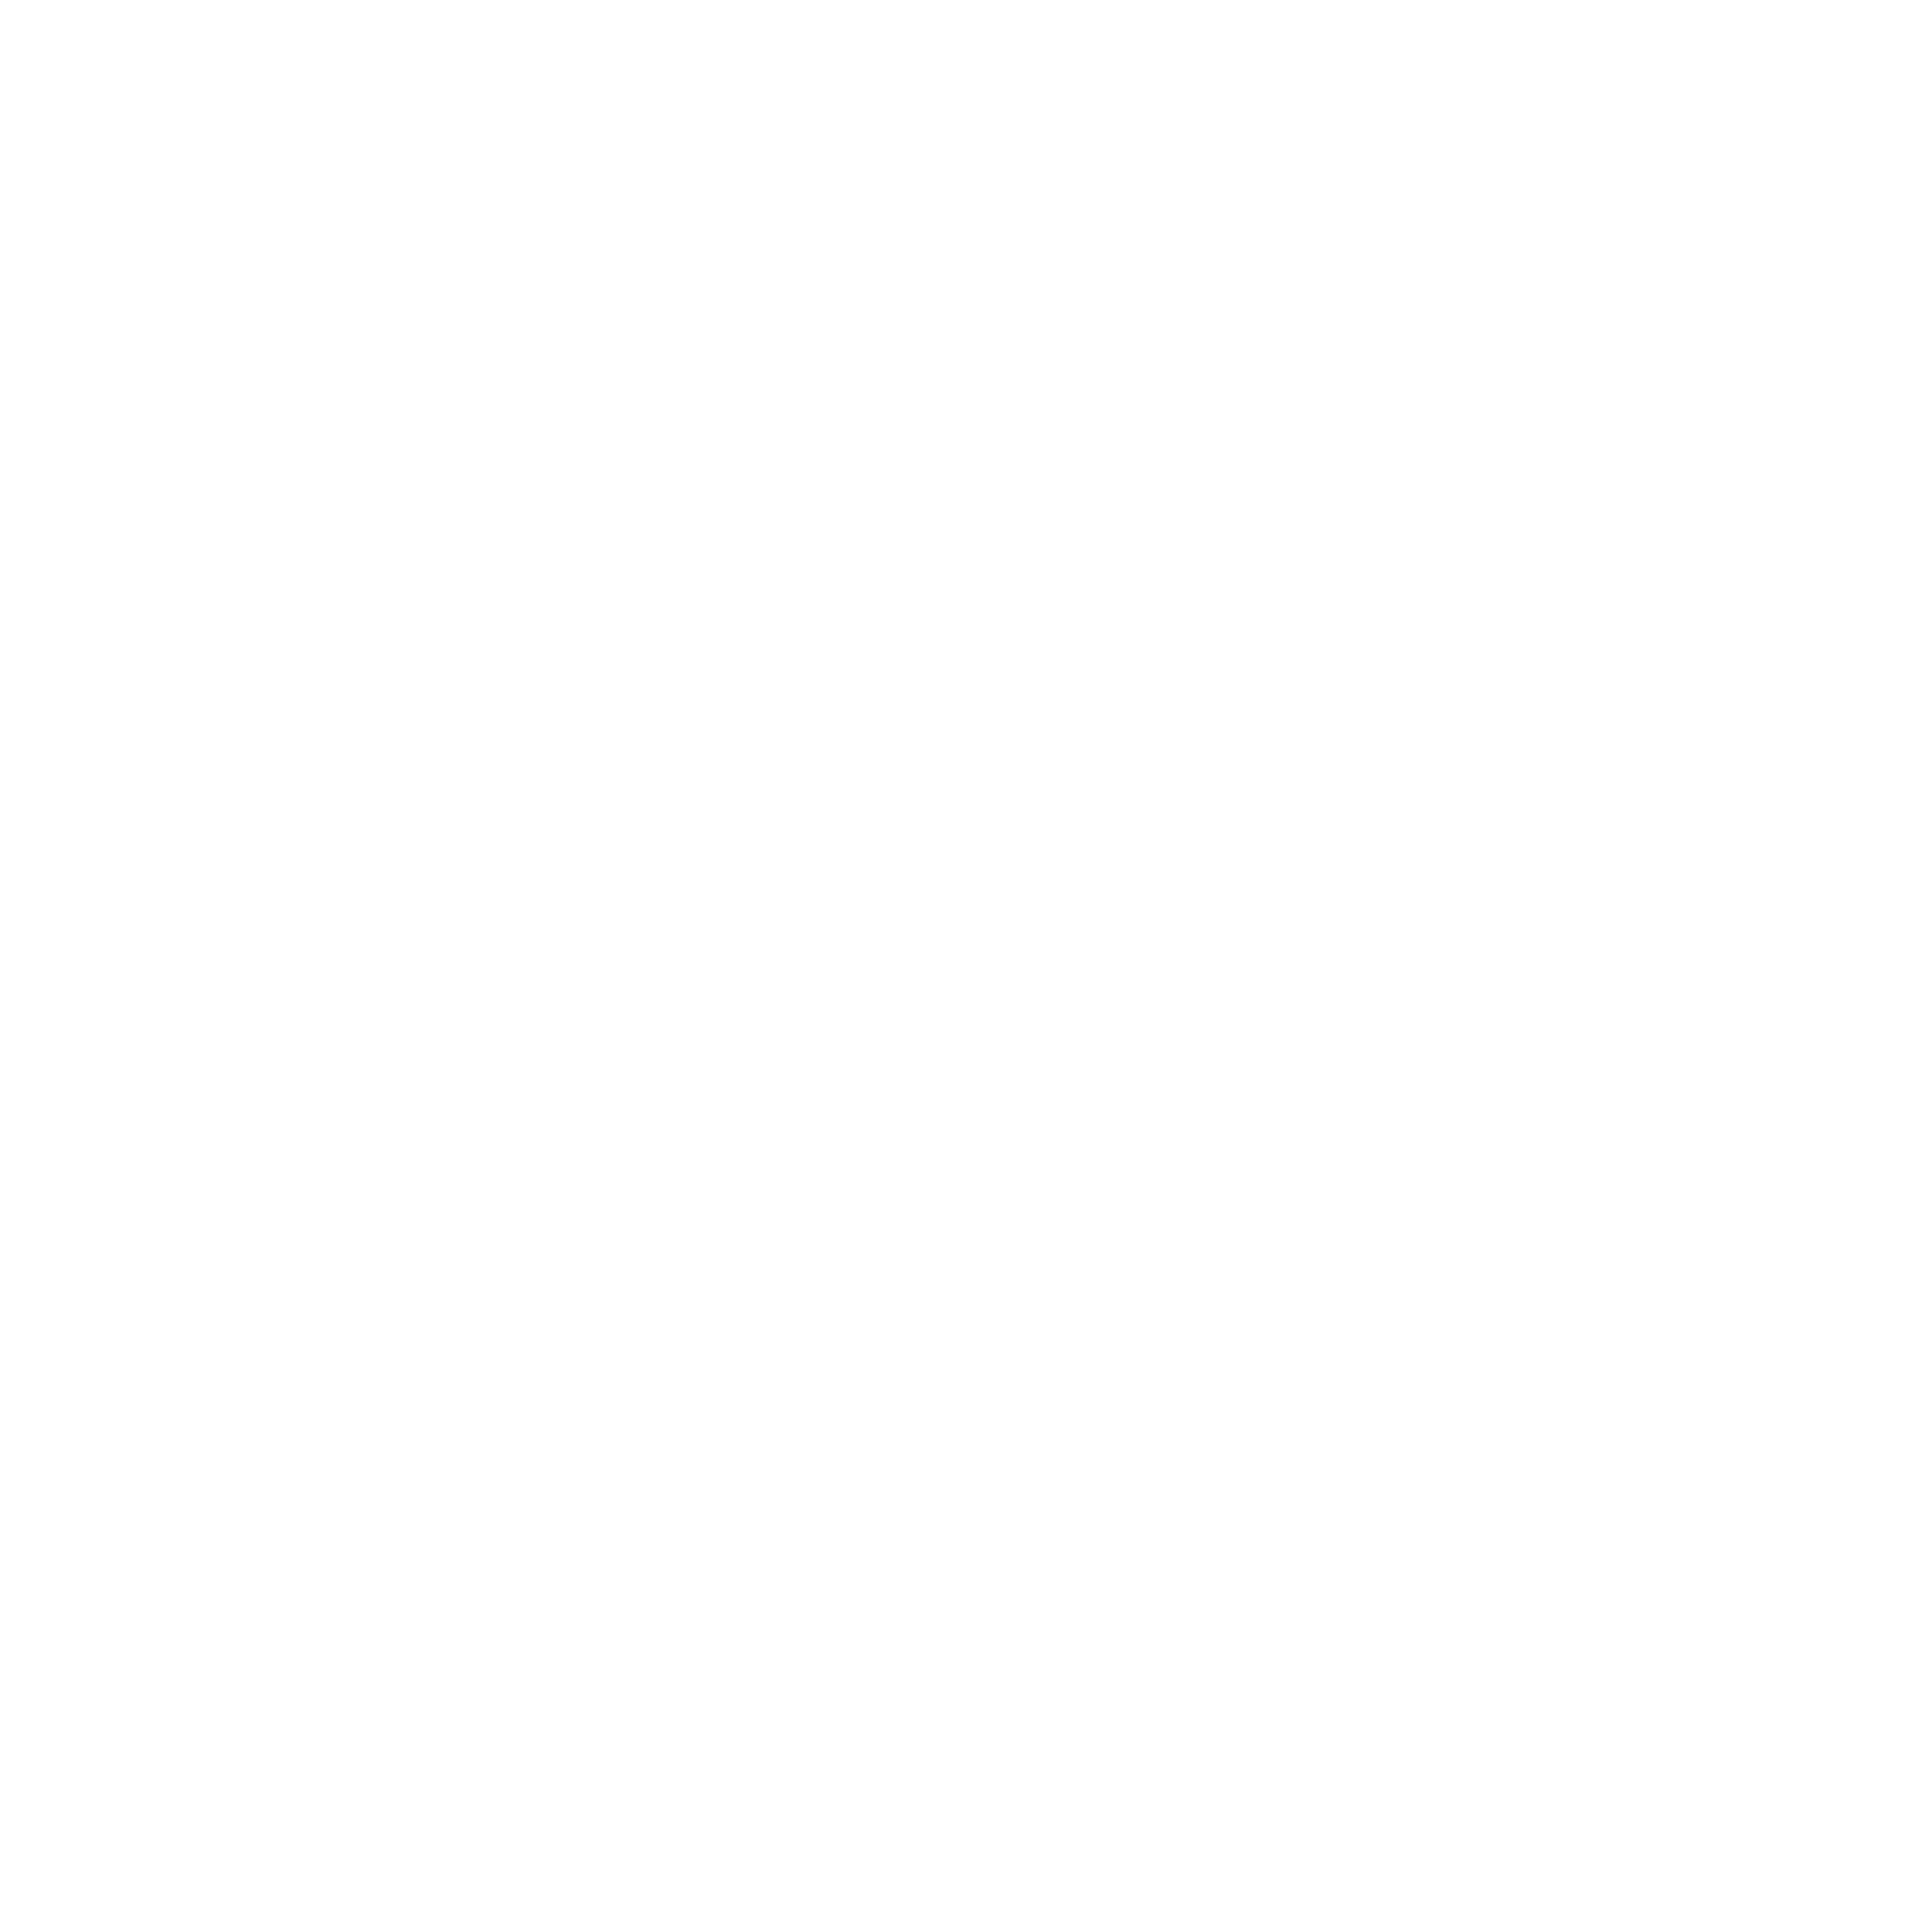 AB3-63A